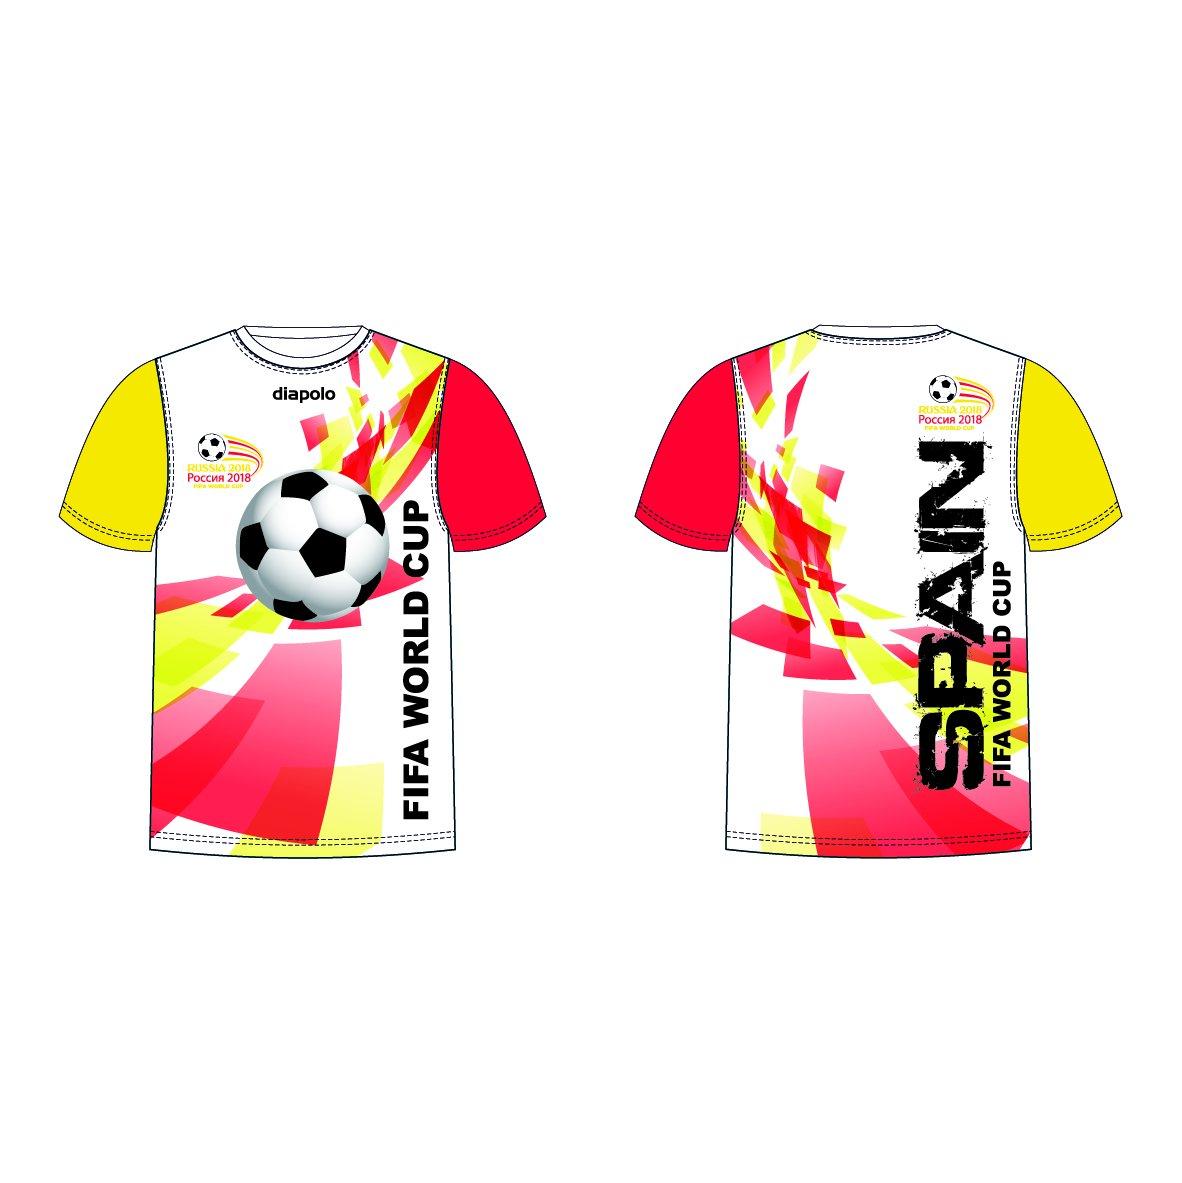 Diapolo Professional Atmungsaktiv Qualitativ Hochfertiger Funktion Fan T-Shirt Spain S M L XL XXL